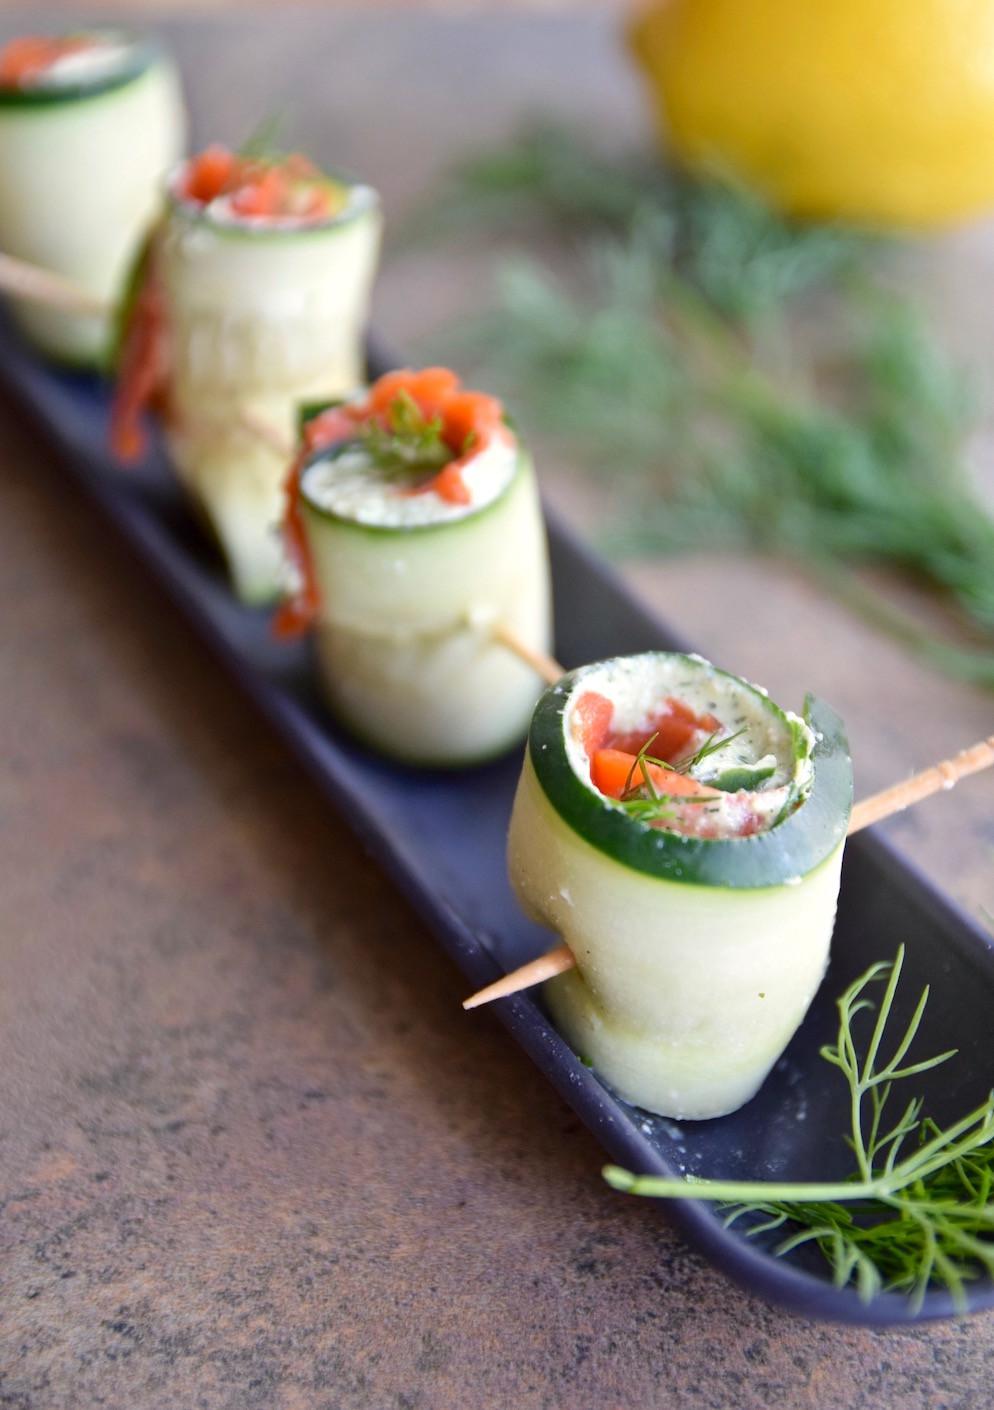 Gluten Free Dairy Free Appetizers  Salmon Cucumber Roll Ups Gluten Free Dairy Free